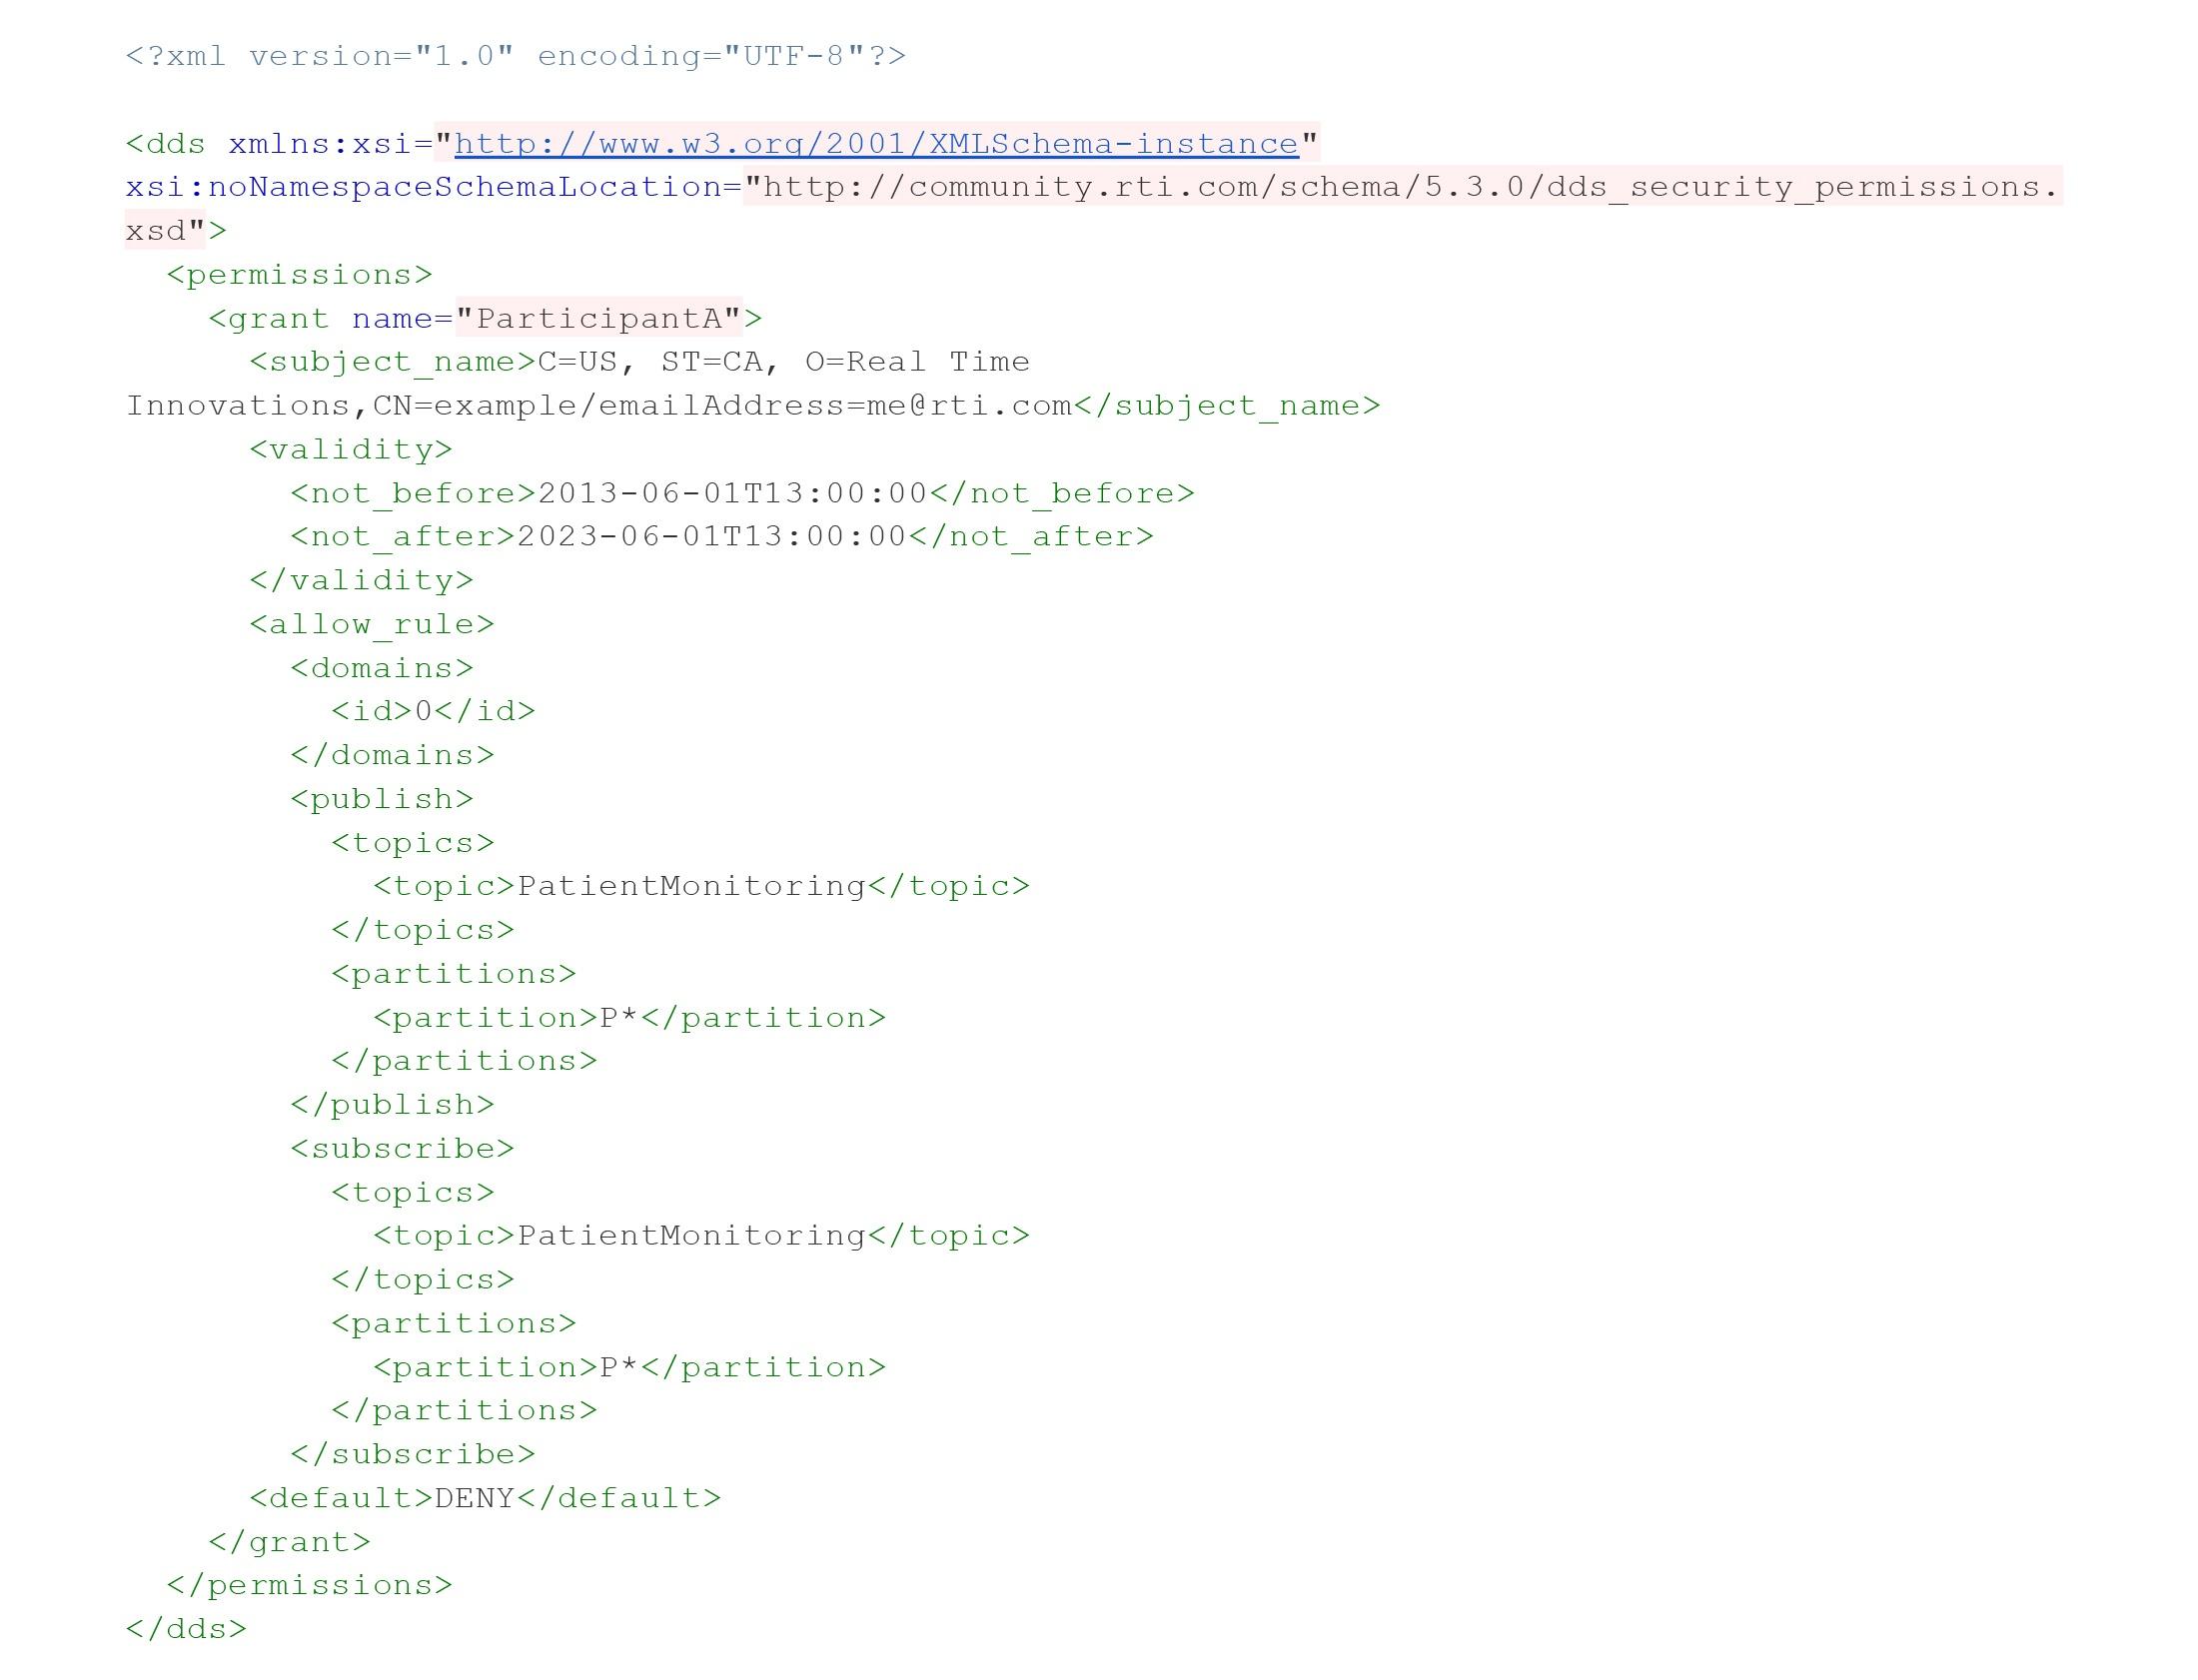 rti-diagram-connext-dds-secure-coding-3-0917.jpg